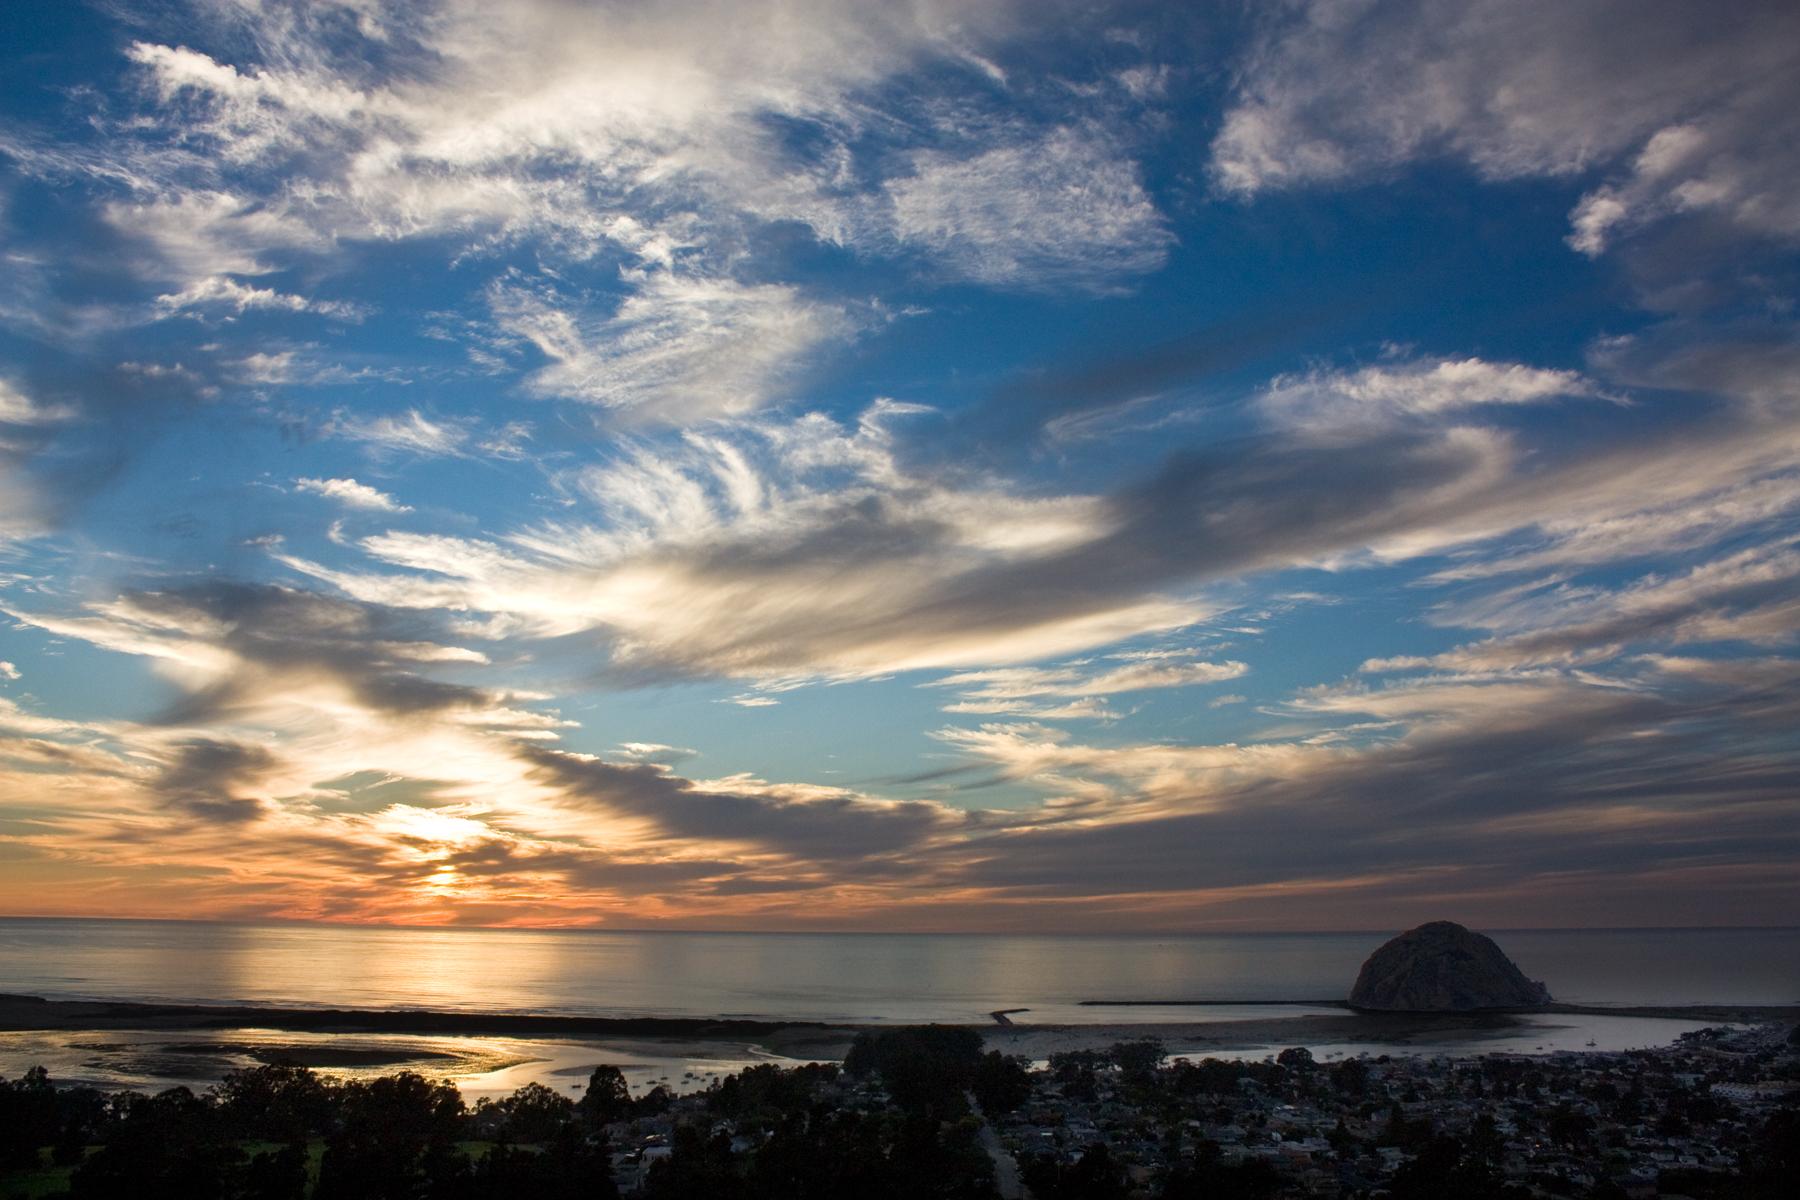 My hometown: Morro Bay, California